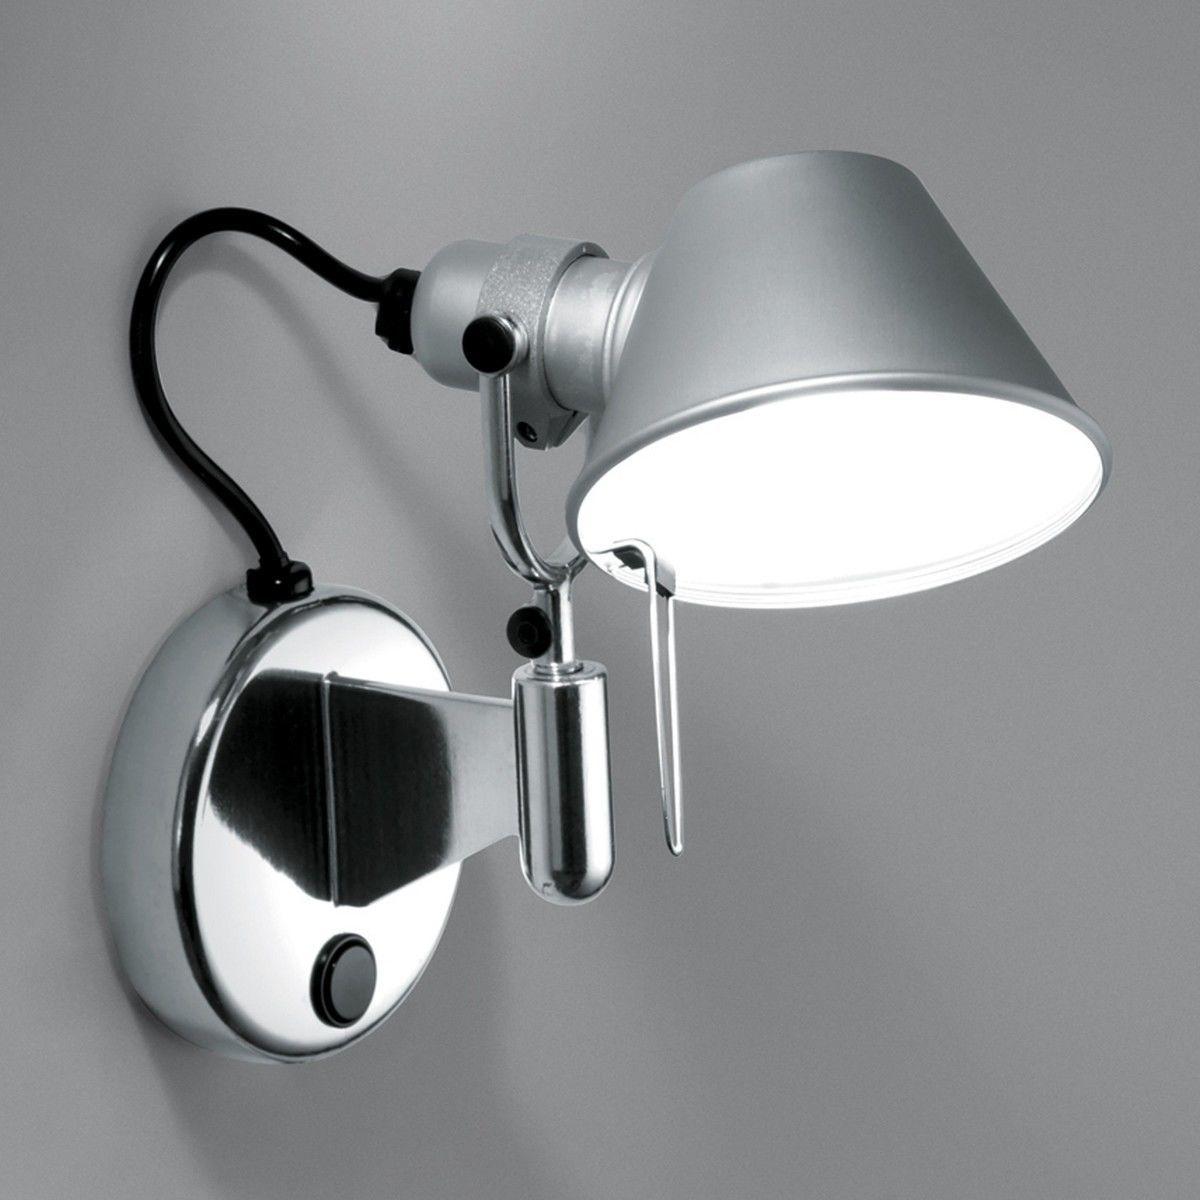 artemide tolomeo micro faretto applique artemide. Black Bedroom Furniture Sets. Home Design Ideas